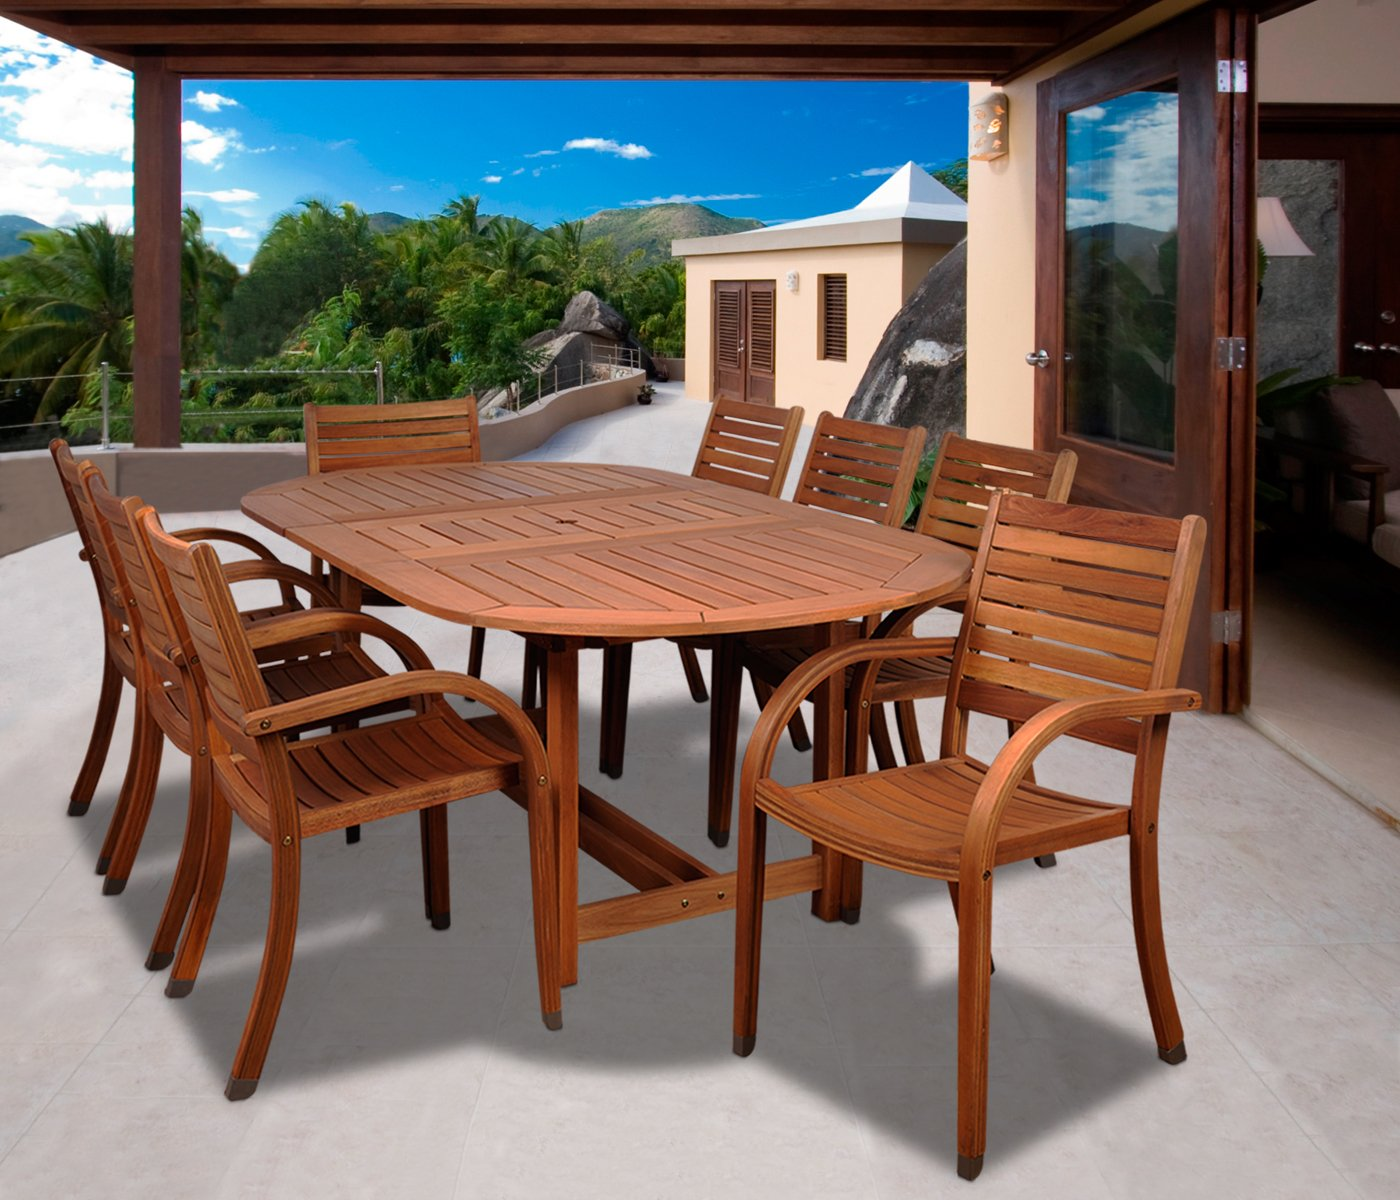 Amazon.com : Amazonia Arizona 9 Piece Eucalyptus Oval Dining Set : Outdoor  And Patio Furniture Sets : Garden U0026 Outdoor